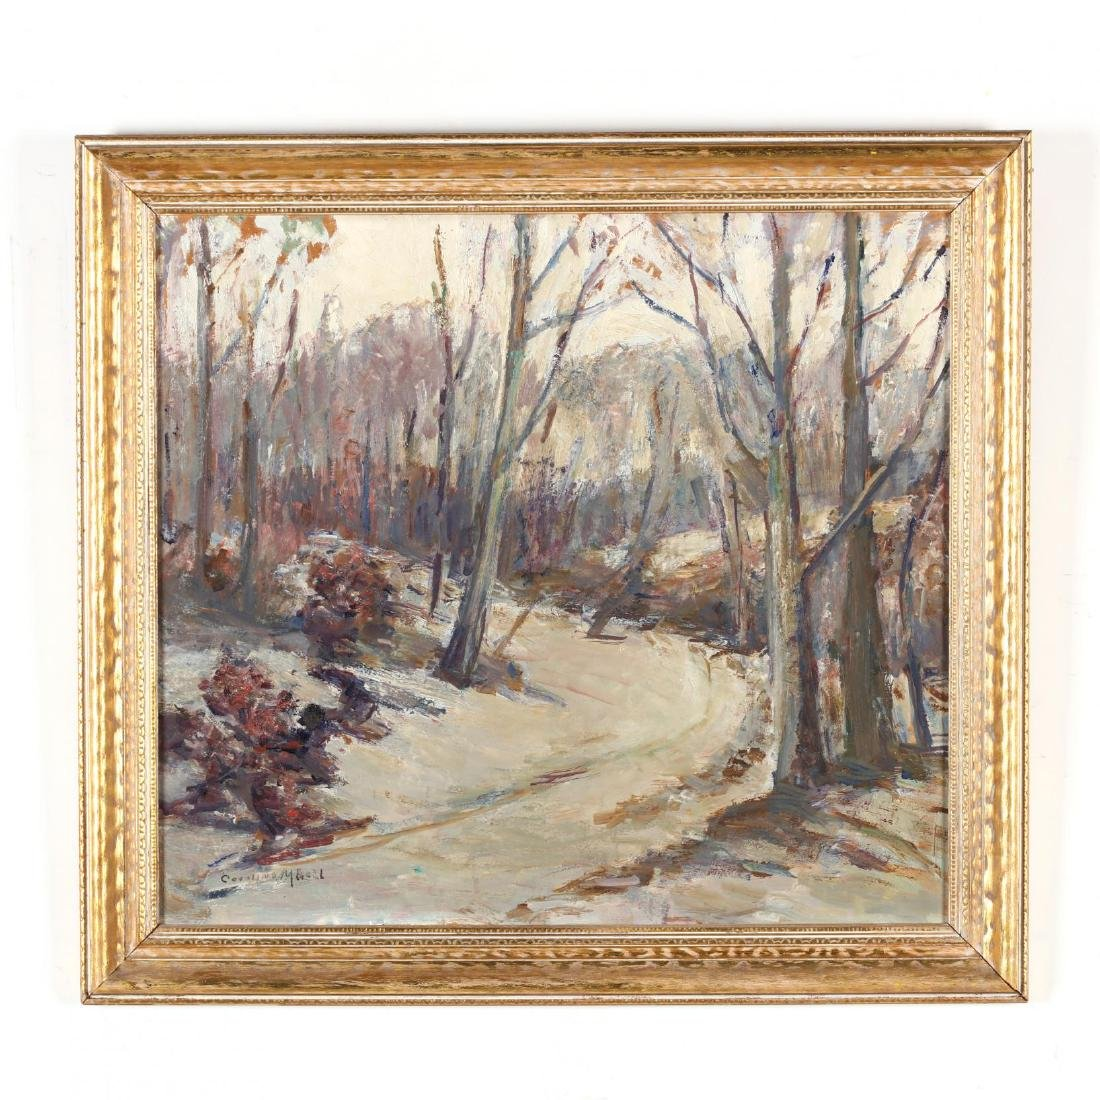 Caroline M. Bell (NY, 1874-1970), Winter Landscape